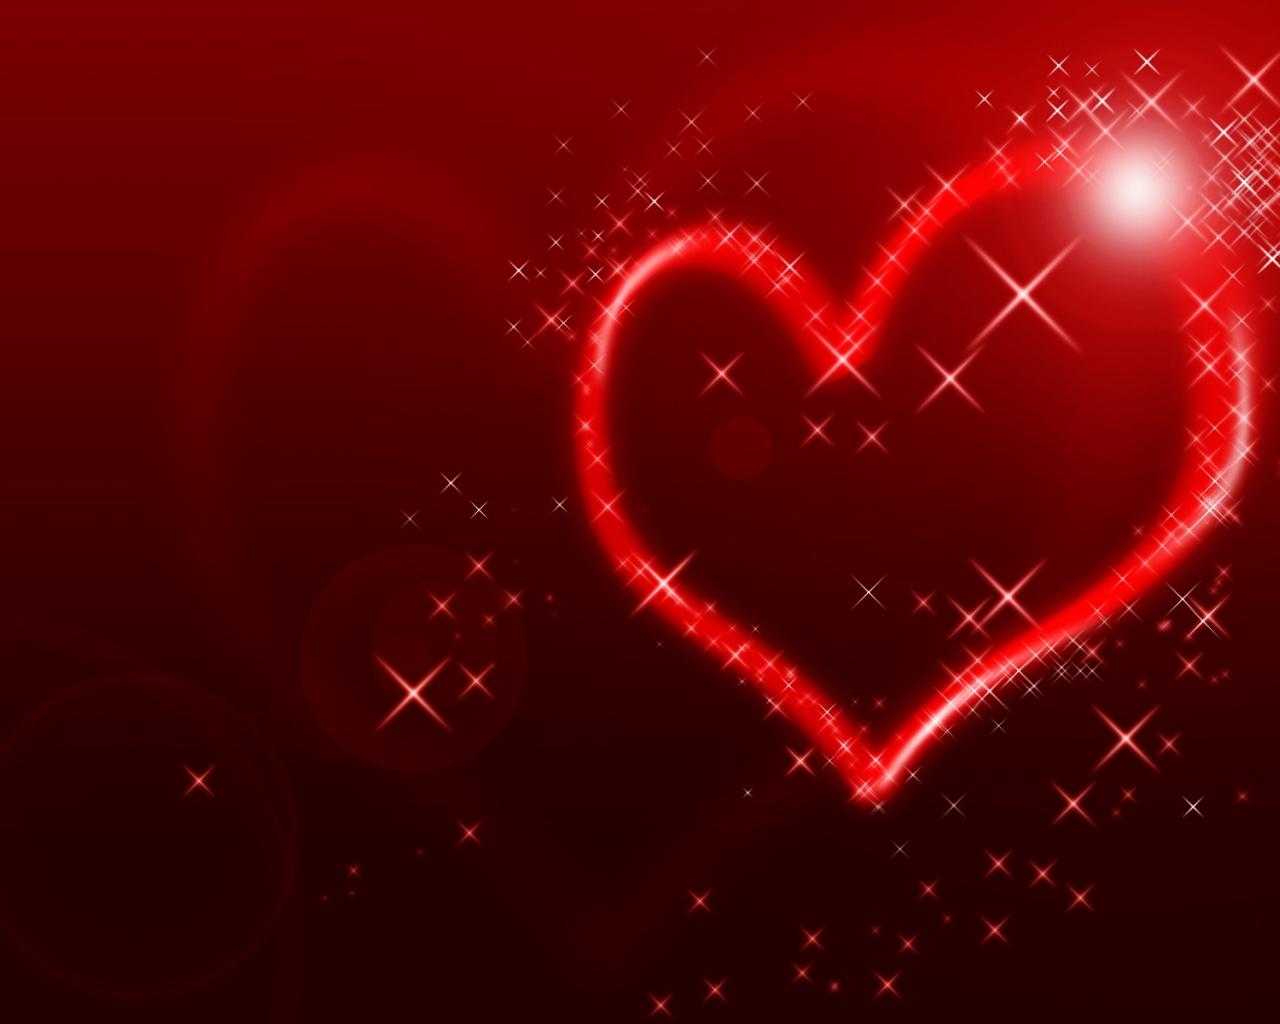 http://3.bp.blogspot.com/-TJ-6Hw8nJUY/Tg02QJ_dk1I/AAAAAAAAC7s/jM5em1zzKzY/s1600/coracao.jpg